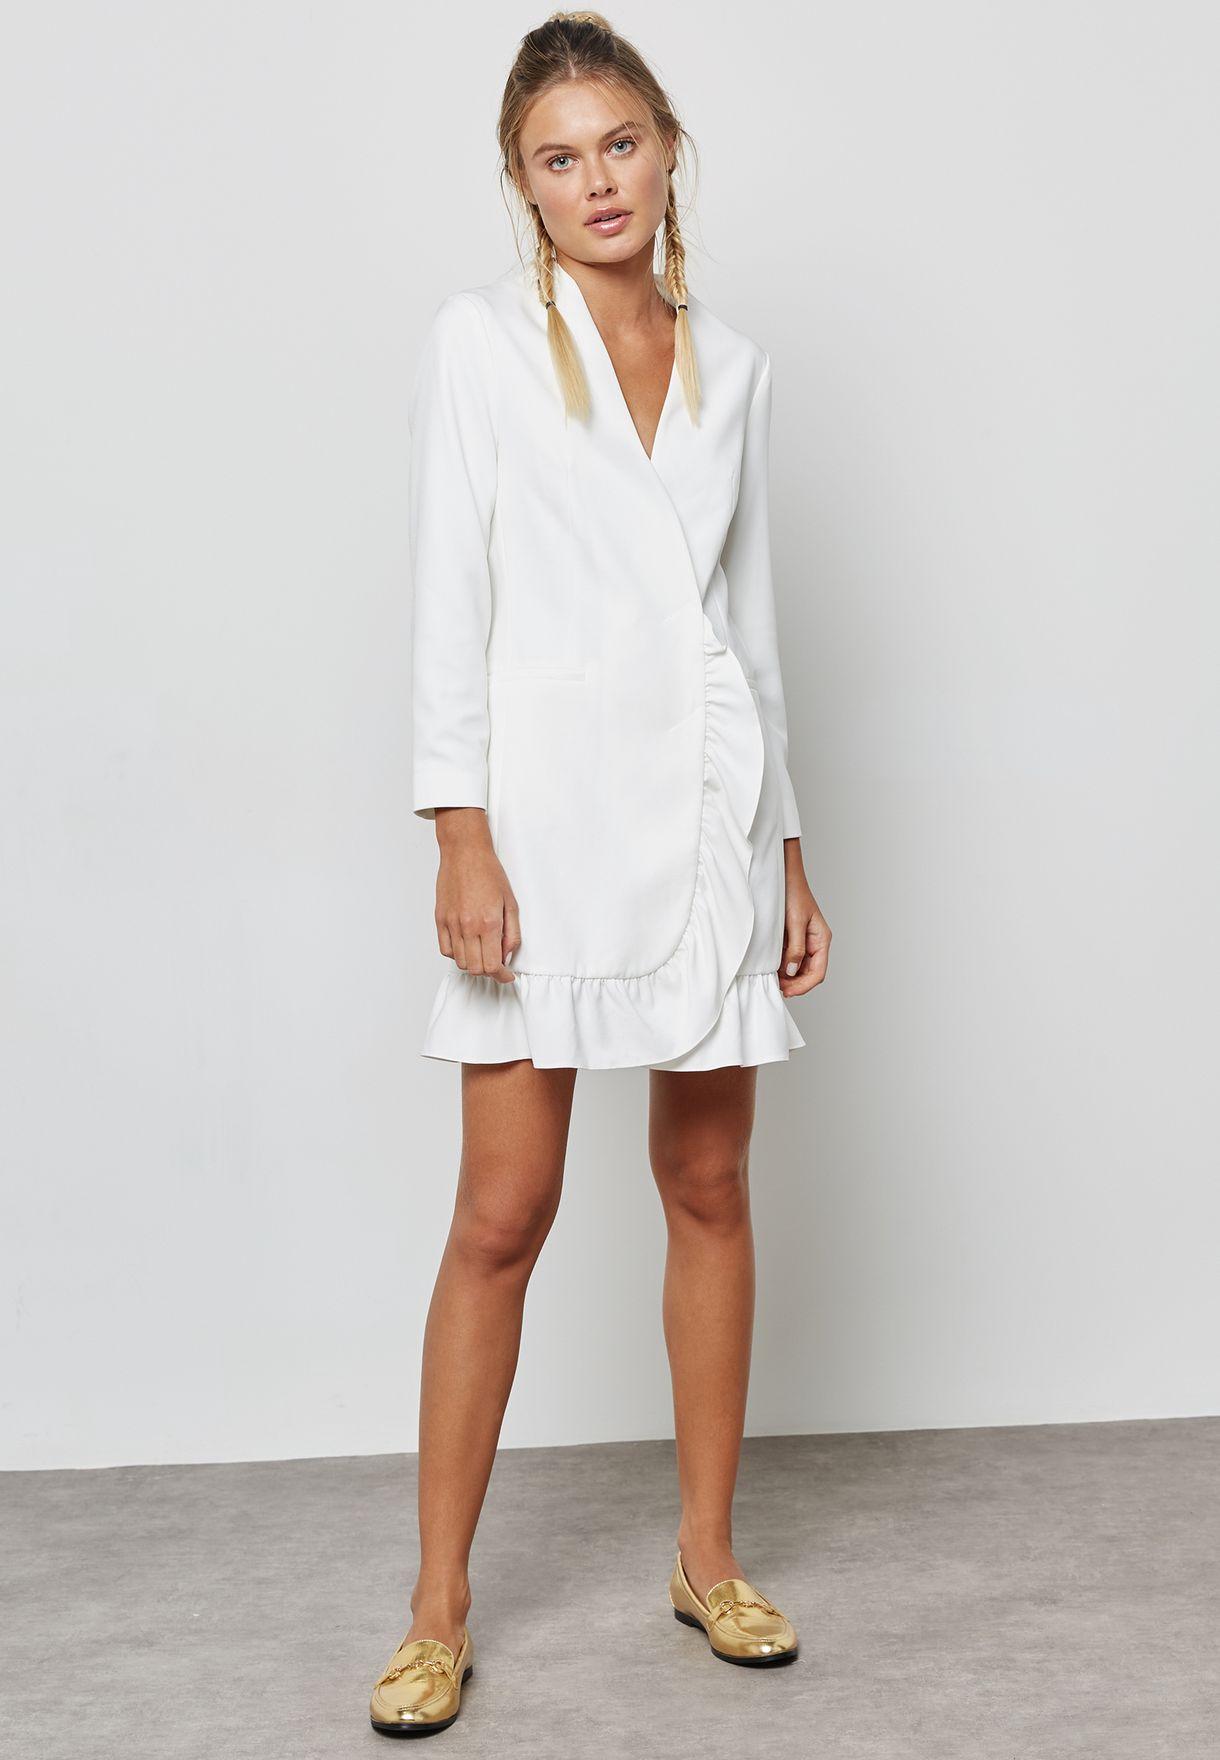 9ac8851131fd Shop Topshop white Ruffle Hem Blazer Dress 17B07MIVR for Women in ...